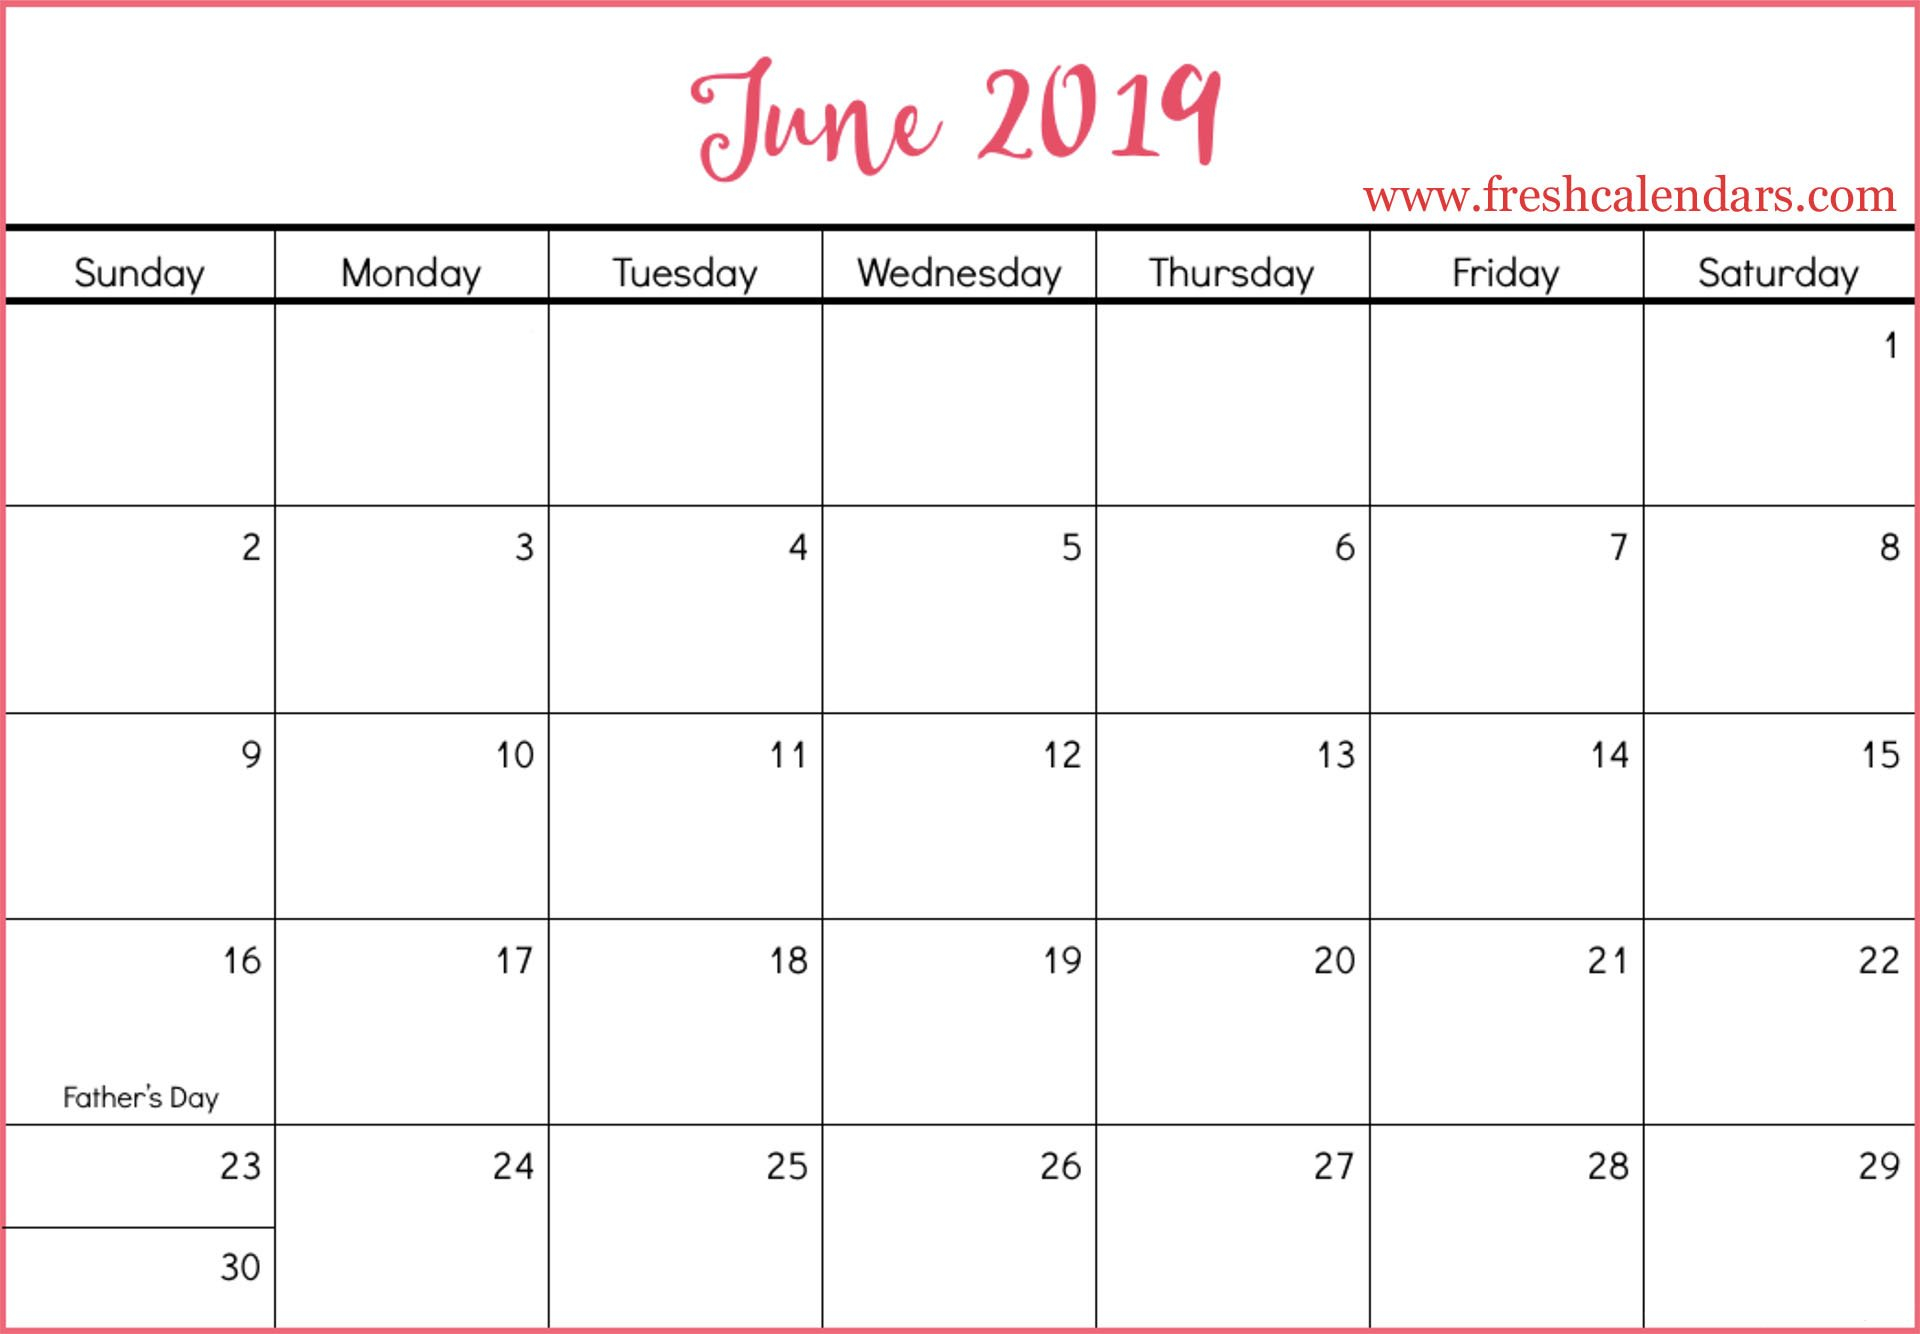 June 2019 Calendar Printable – Fresh Calendars Calendar Of 2019 June